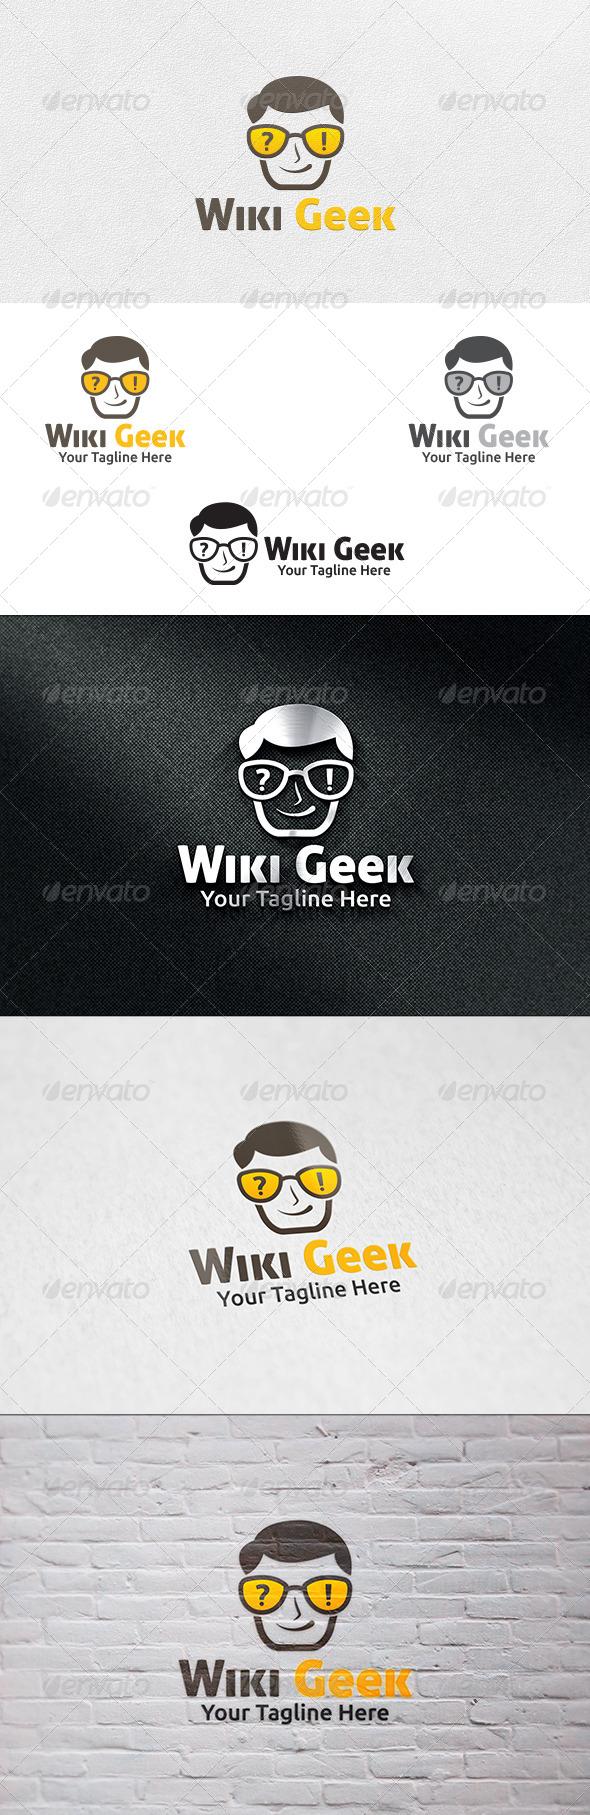 Wiki Geek - Logo Template - Humans Logo Templates